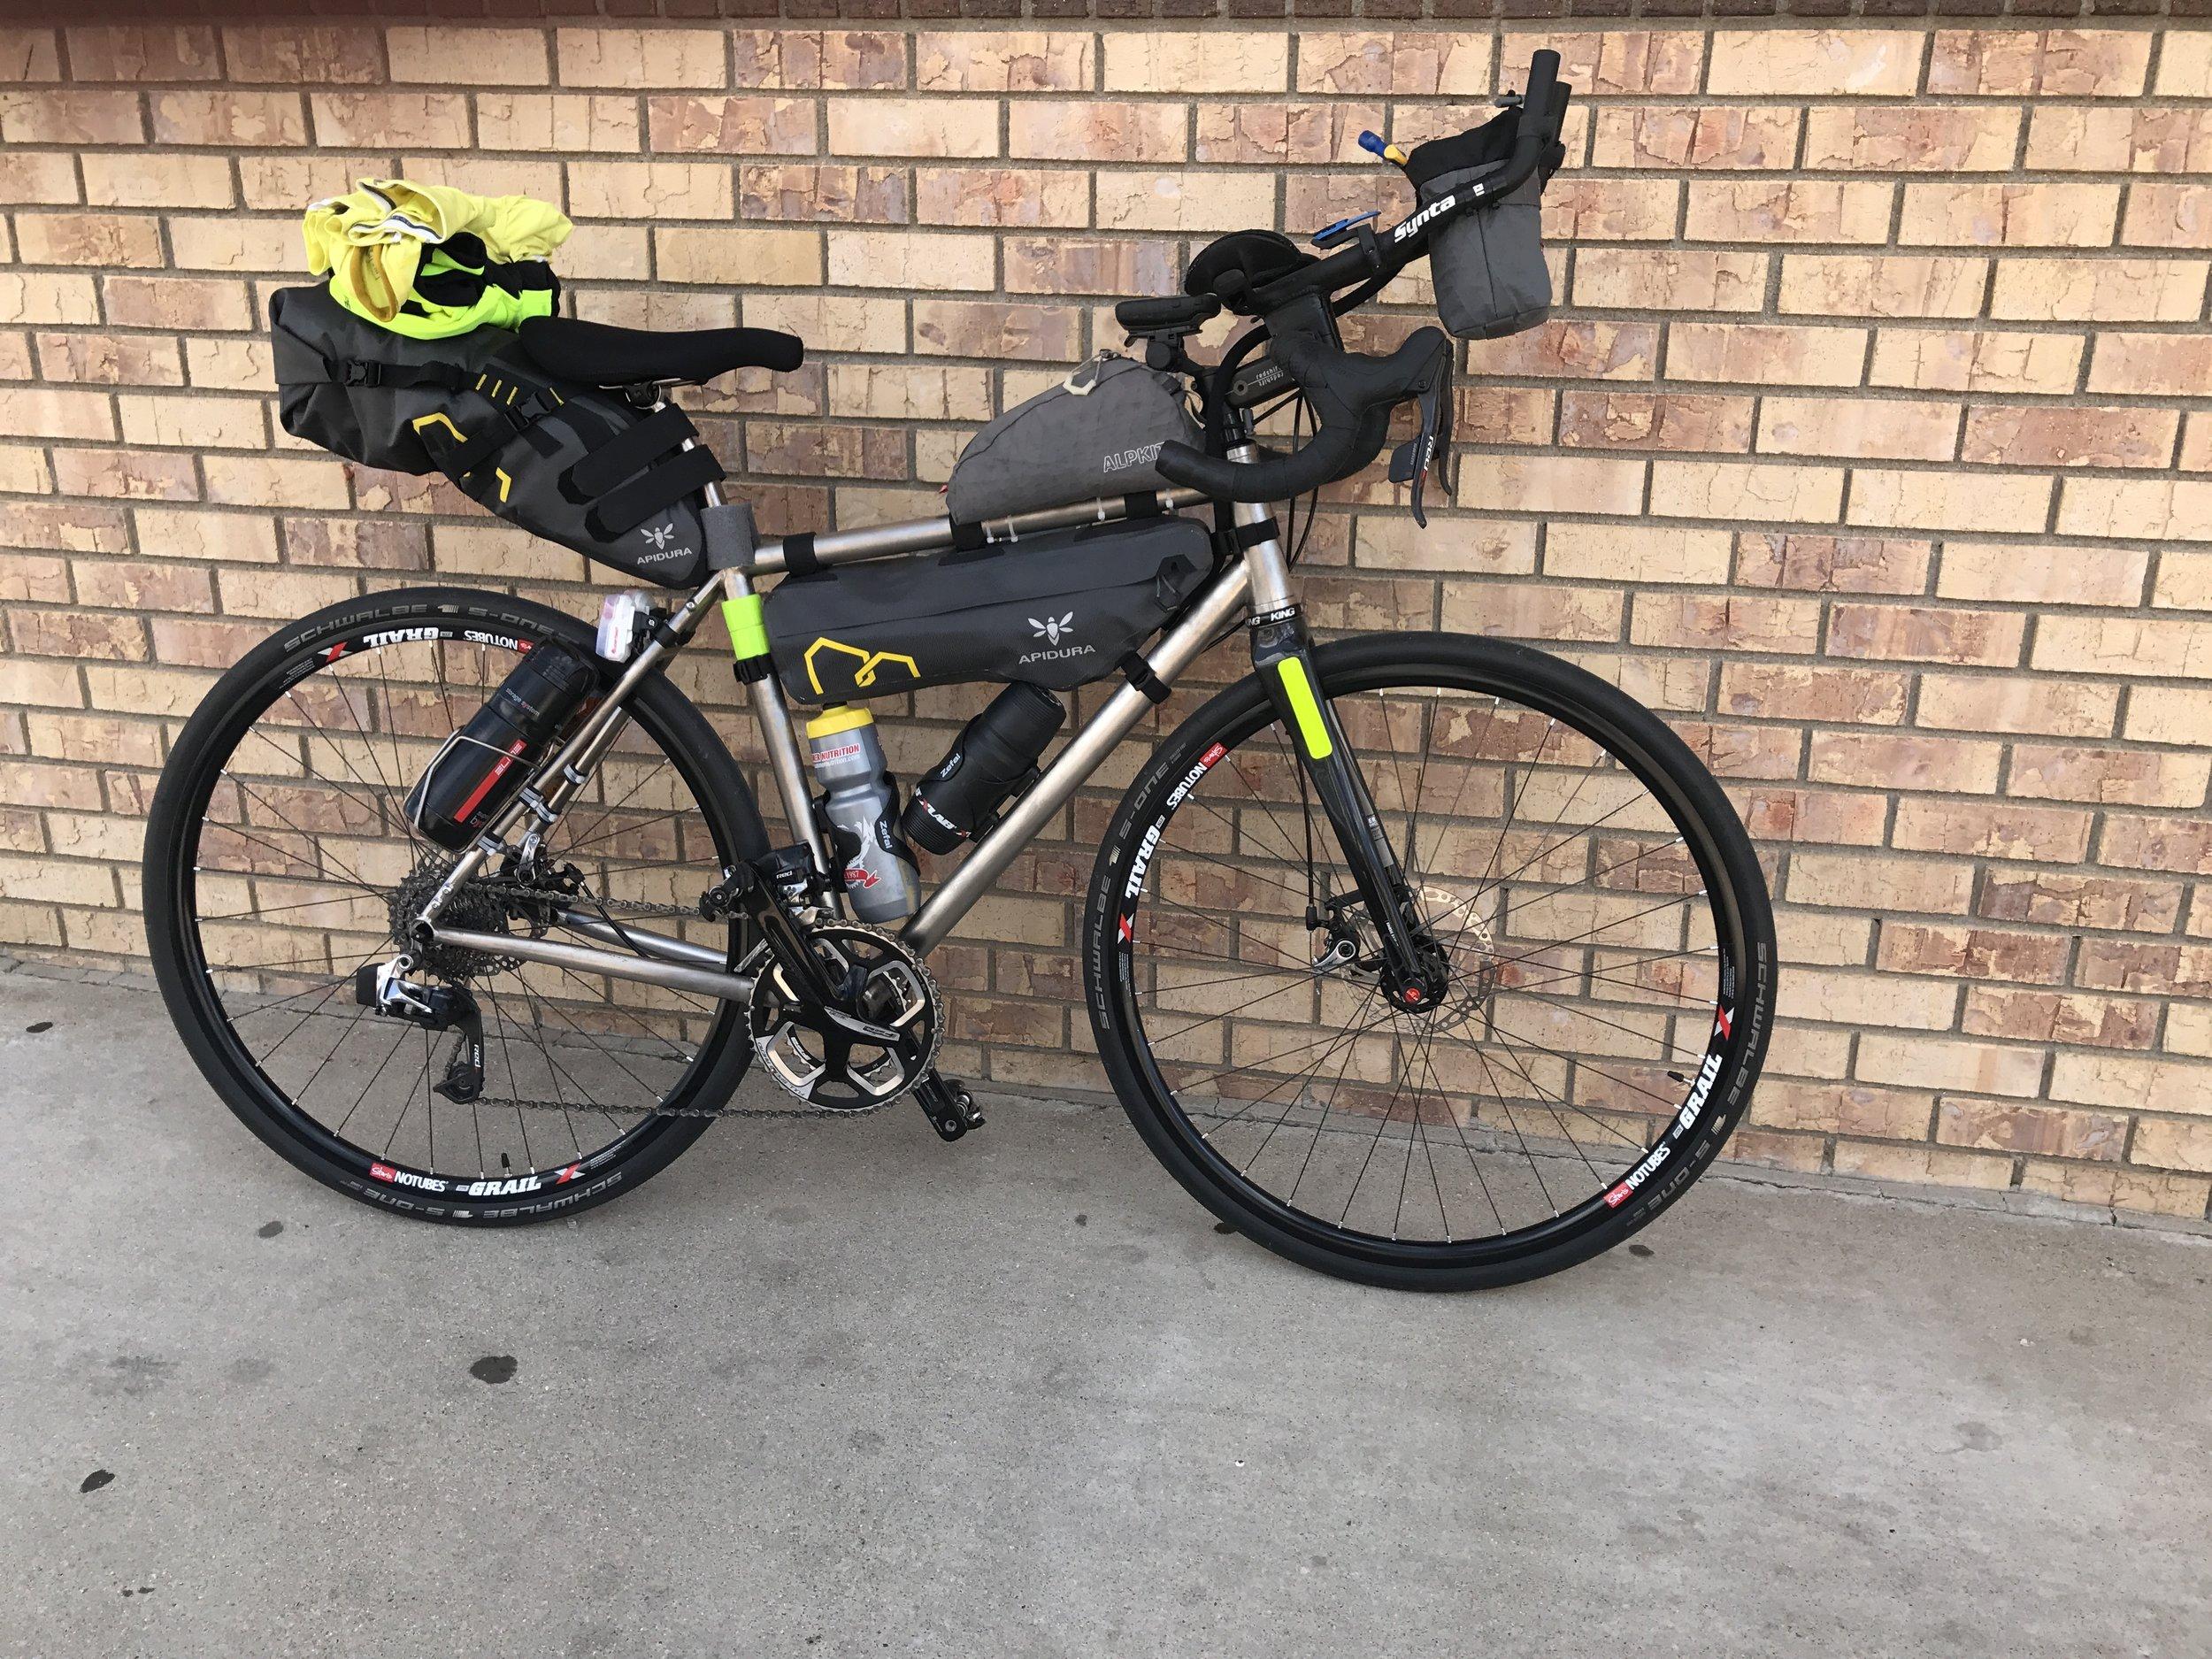 Testing a new bike kit